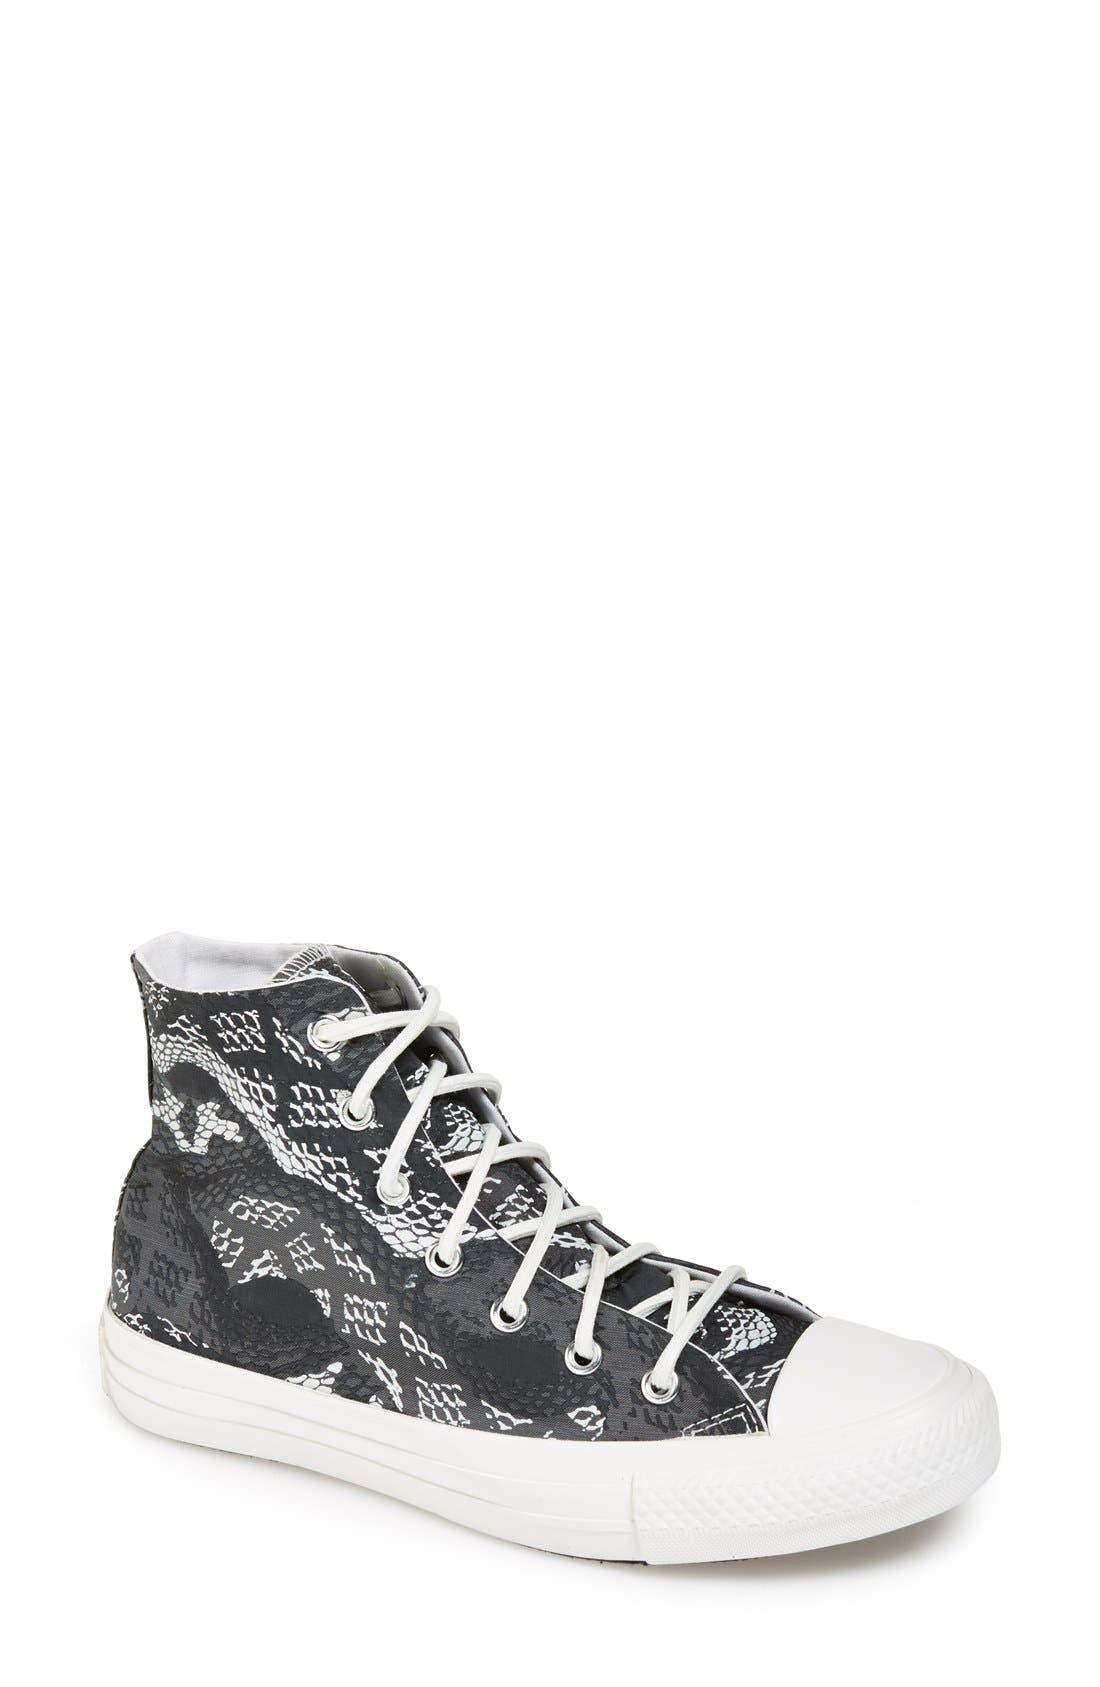 Alternate Image 1 Selected - Converse Chuck Taylor® 'Reptile Print' High Top Sneaker (Women)